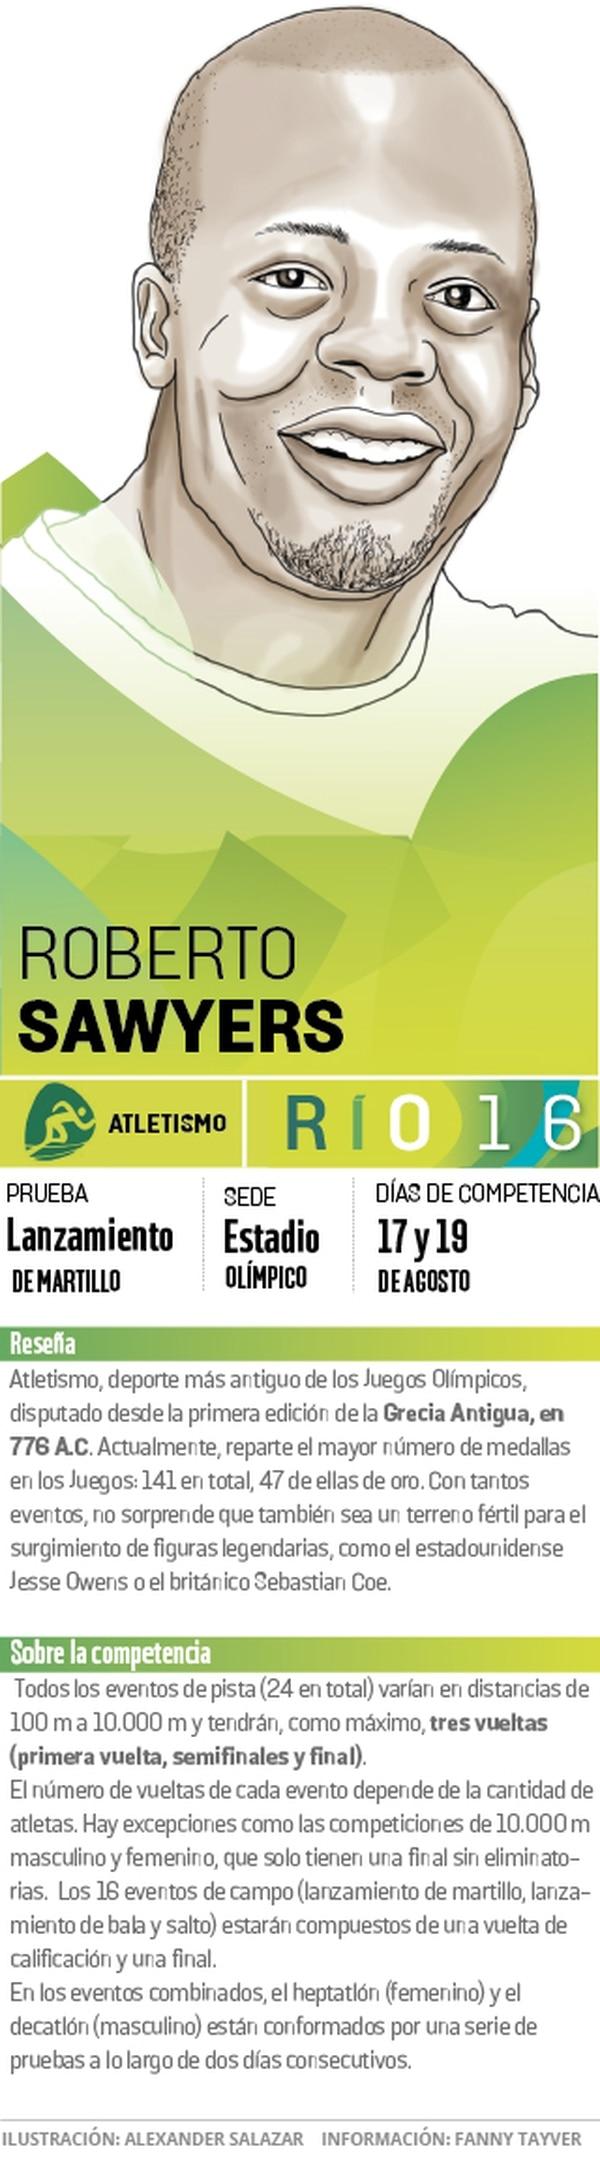 Roberto Sawyers